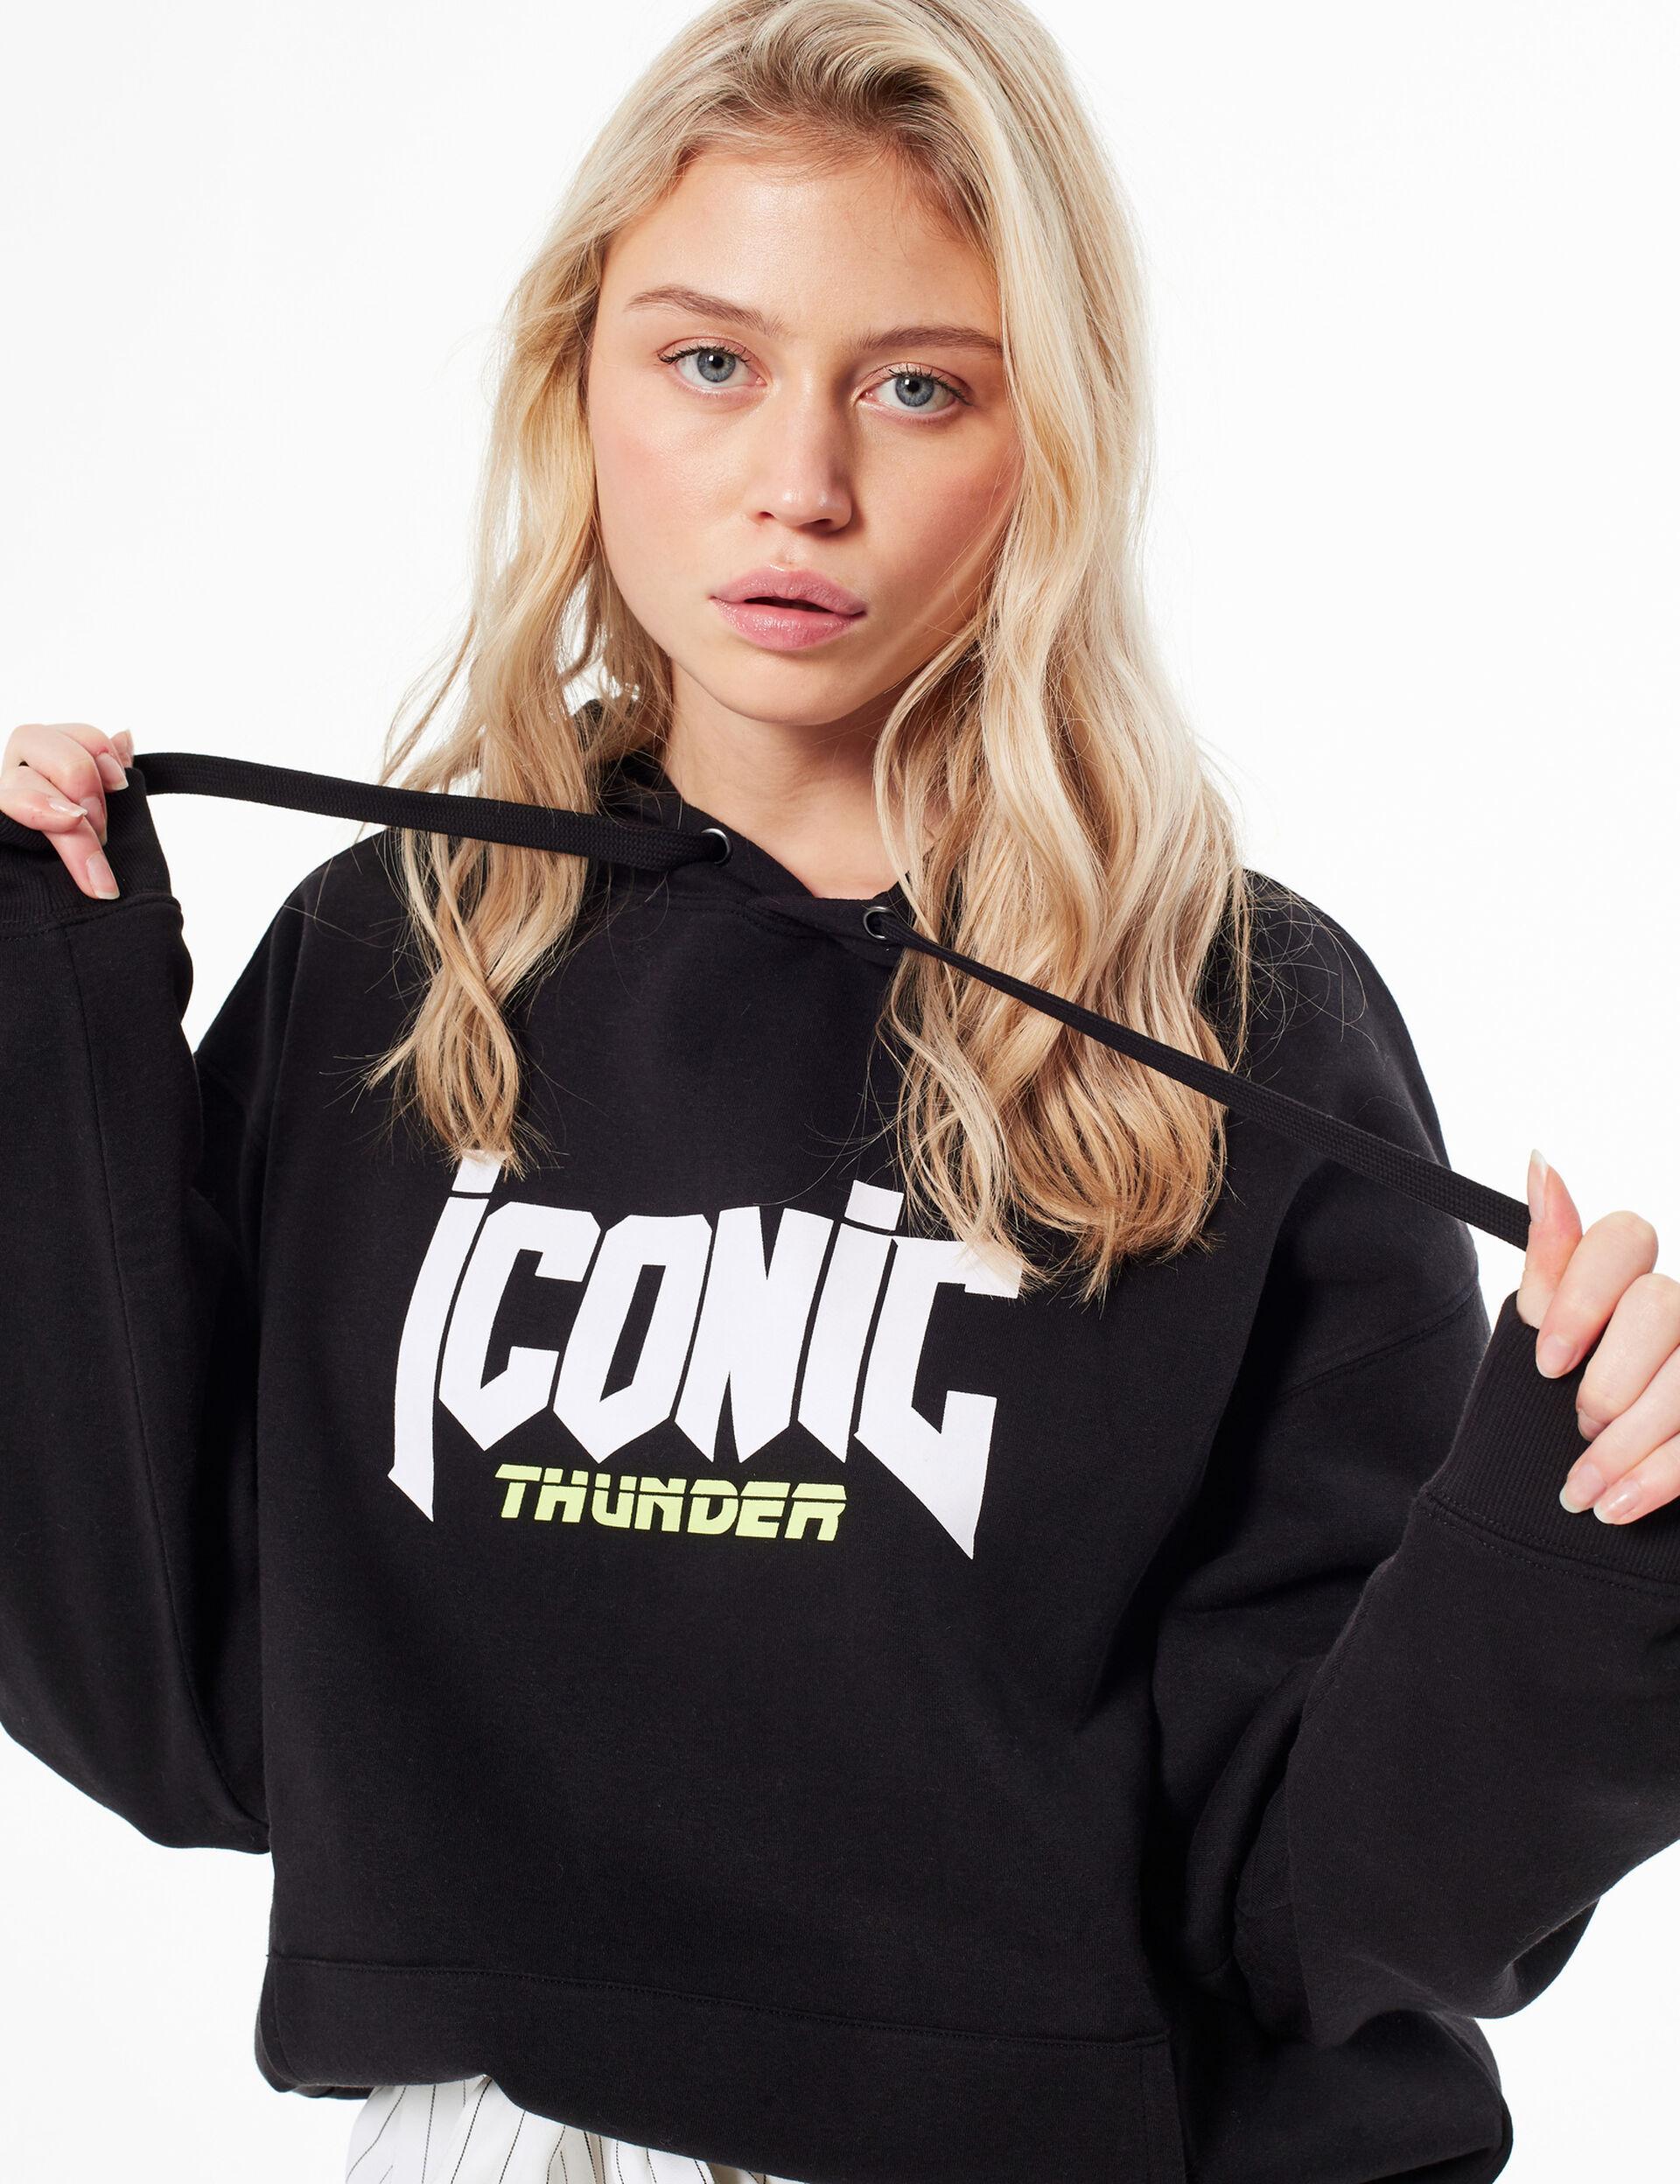 'Iconic thunder' hoodie